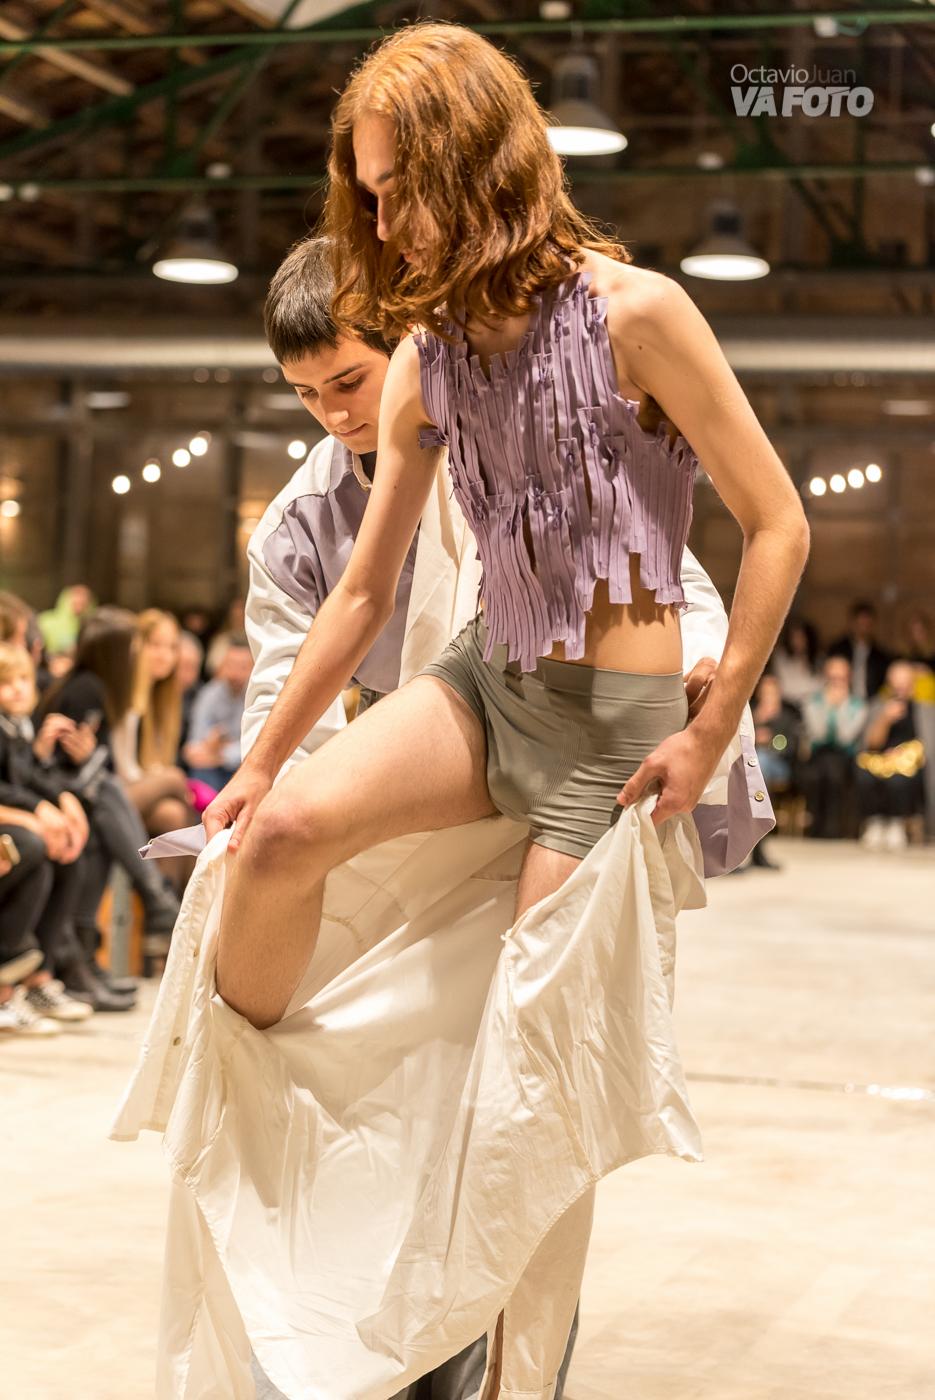 00195 ARTEMODA DSC4294 20181124 - Evento: Arte + Moda Valencia